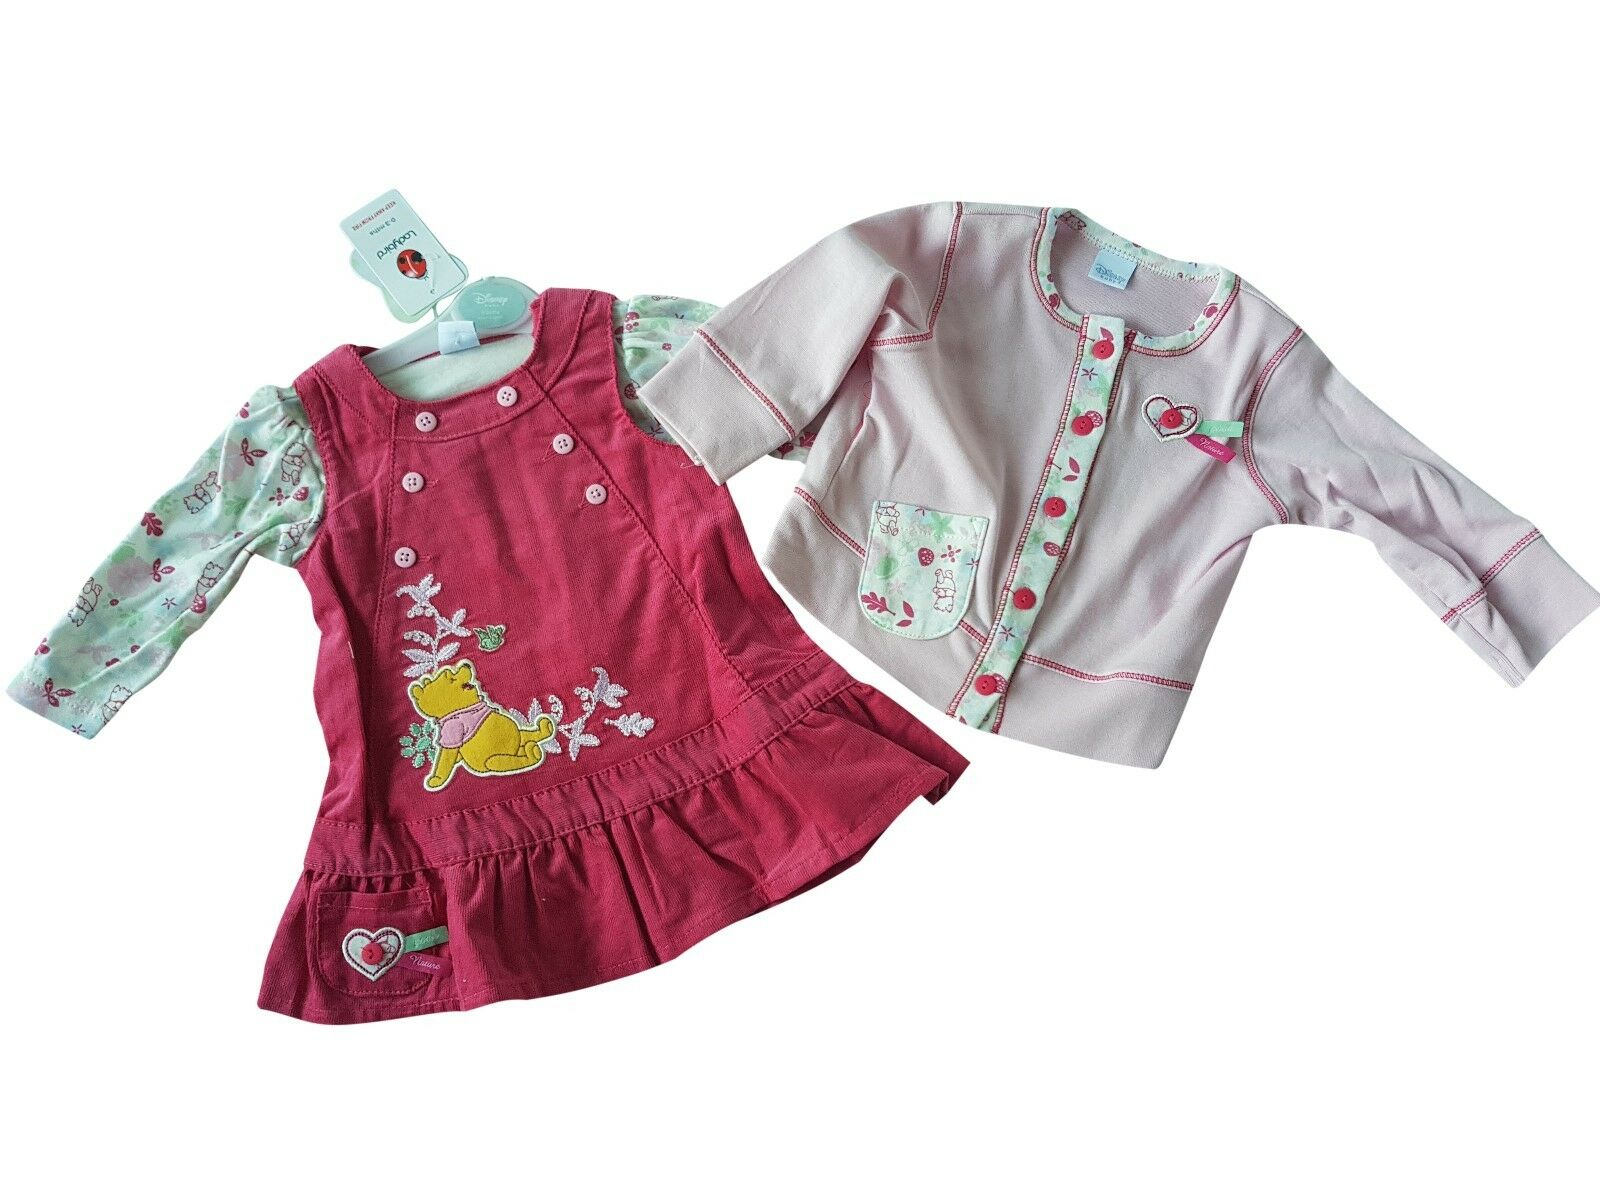 Disney Pooh Velour baby 3 piece jogging suit set pink 0-18 months